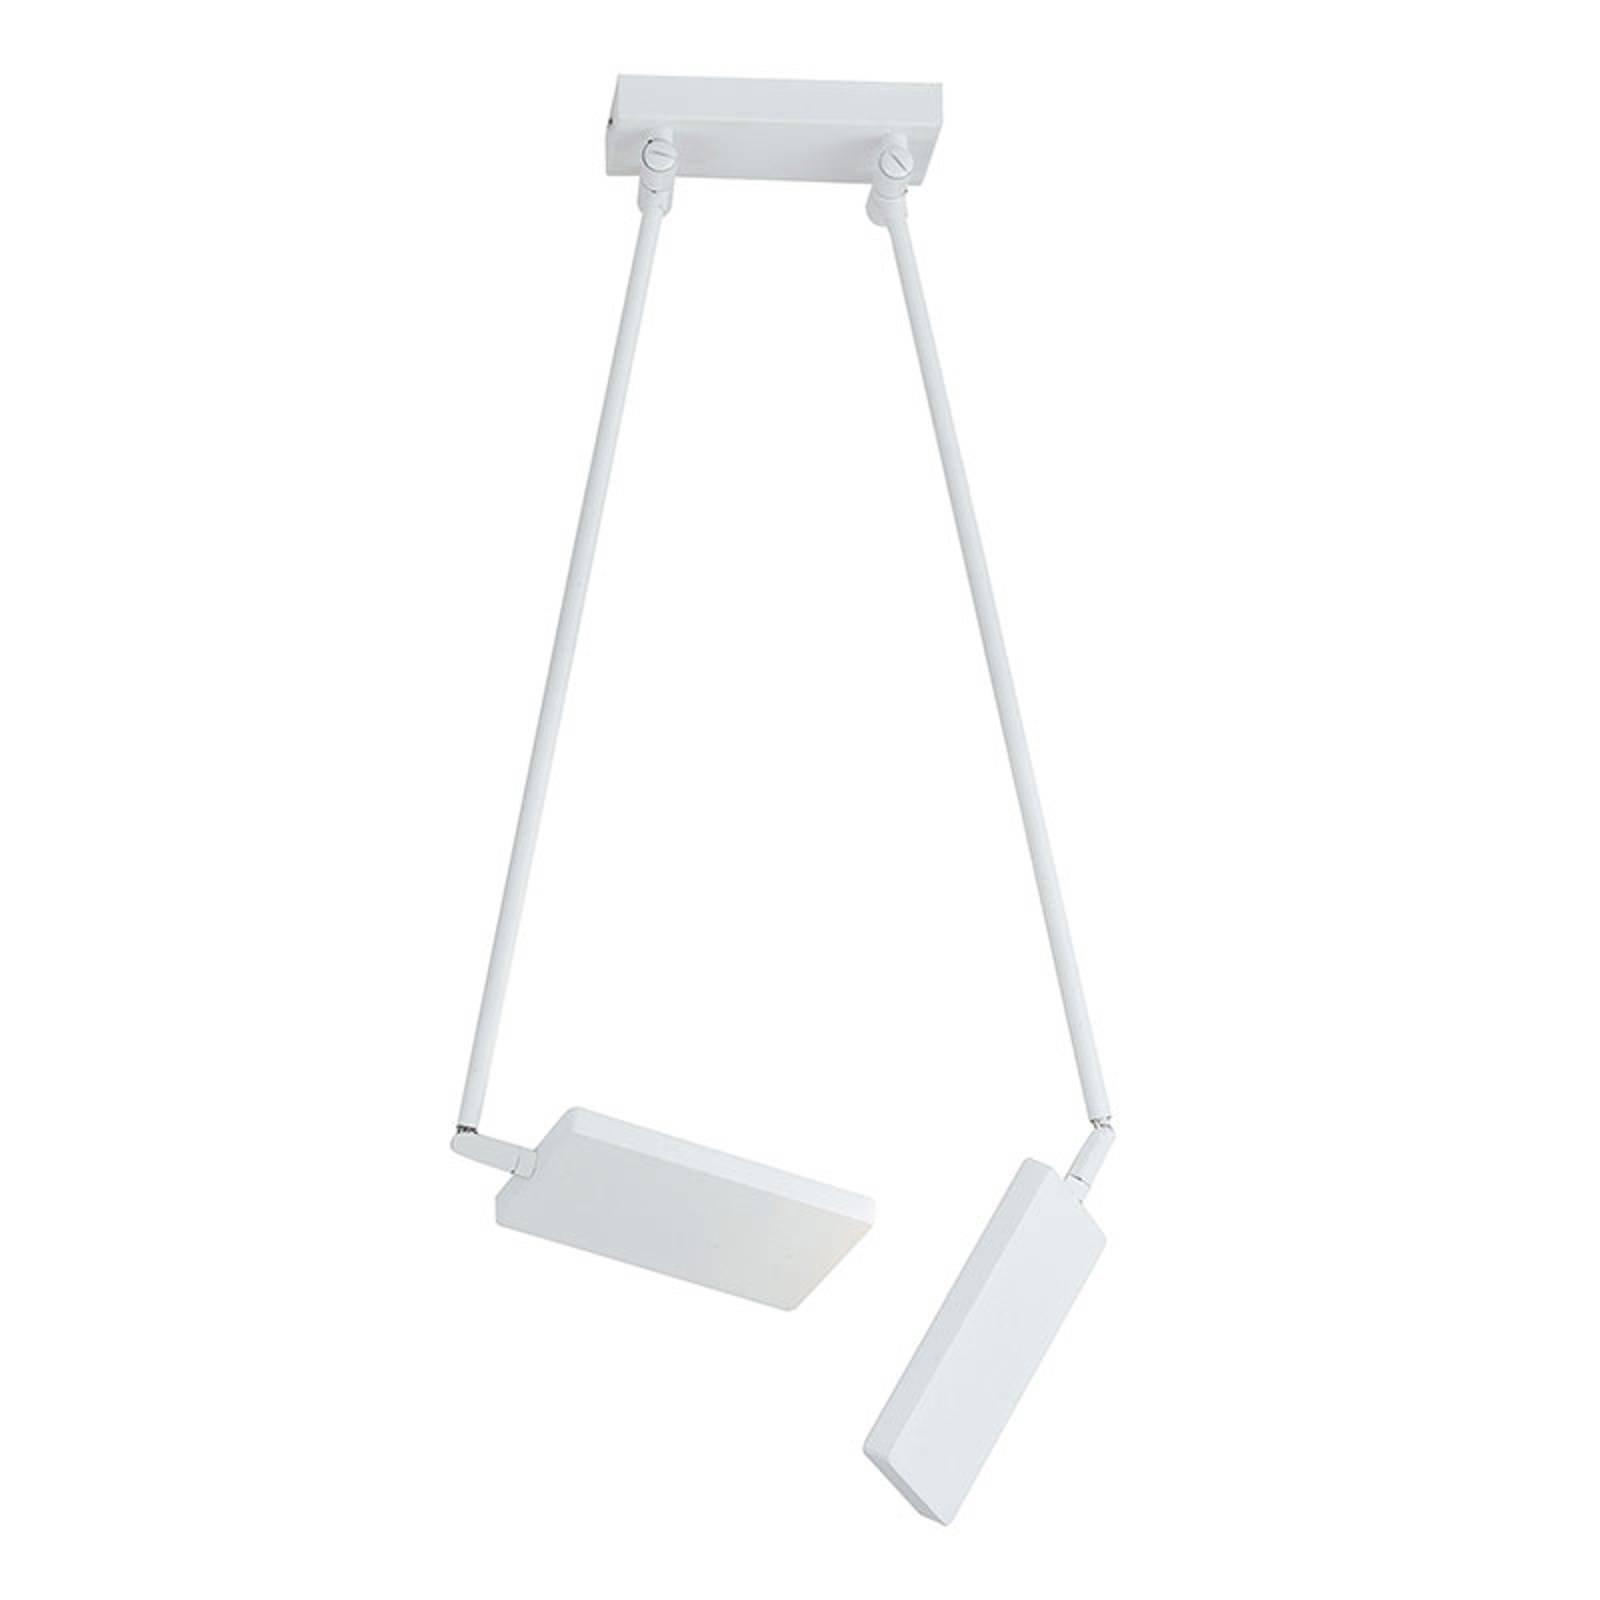 LED-taklampe Book, hvit